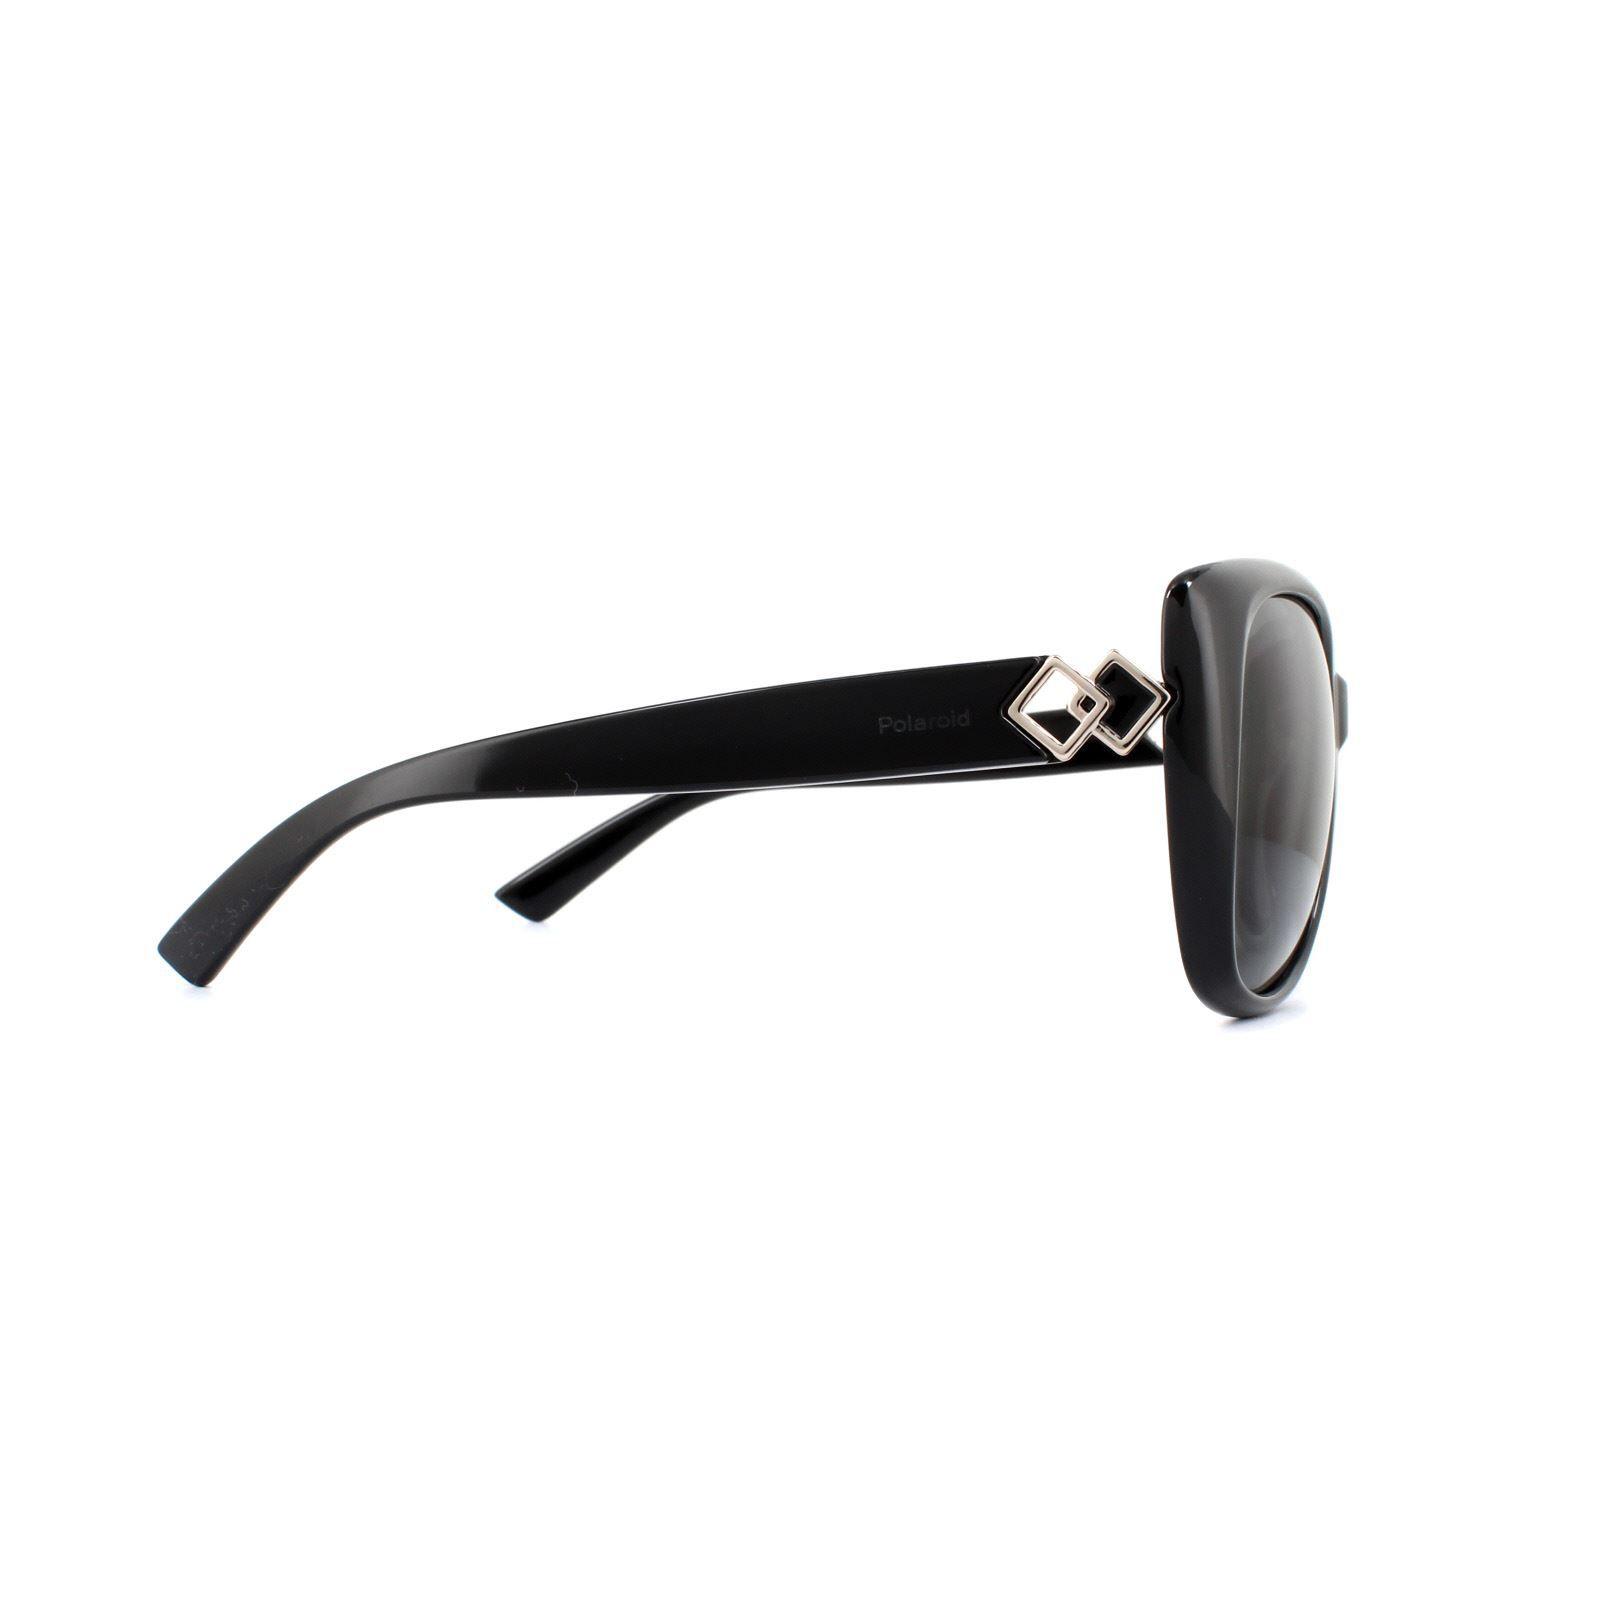 Polaroid Sunglasses PLD 4049/S 807 M9 Black Grey Polarized